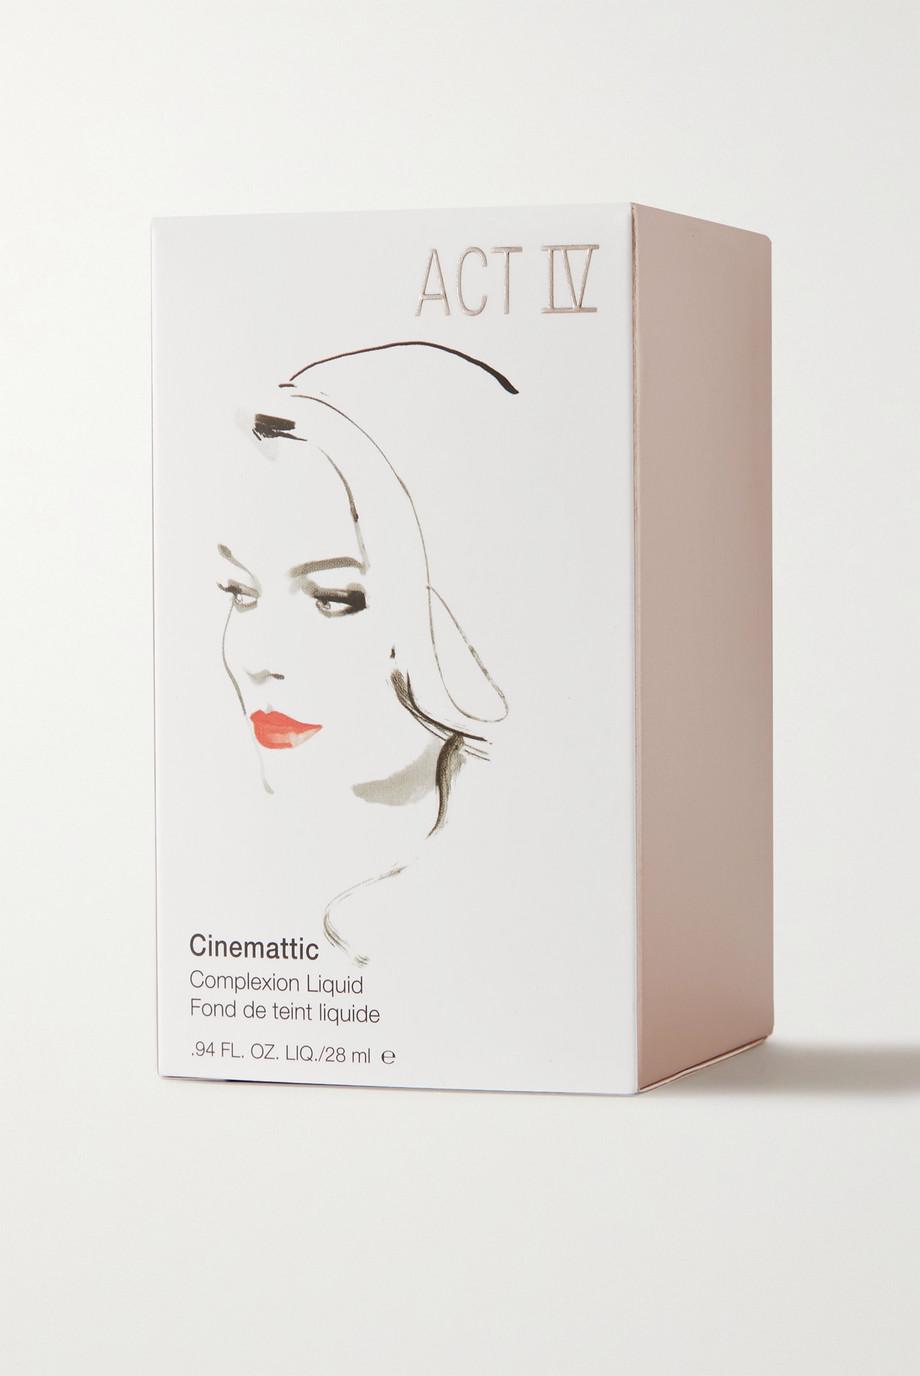 Estée Lauder Act IV Cinemattic Complexion Liquid, 28ml